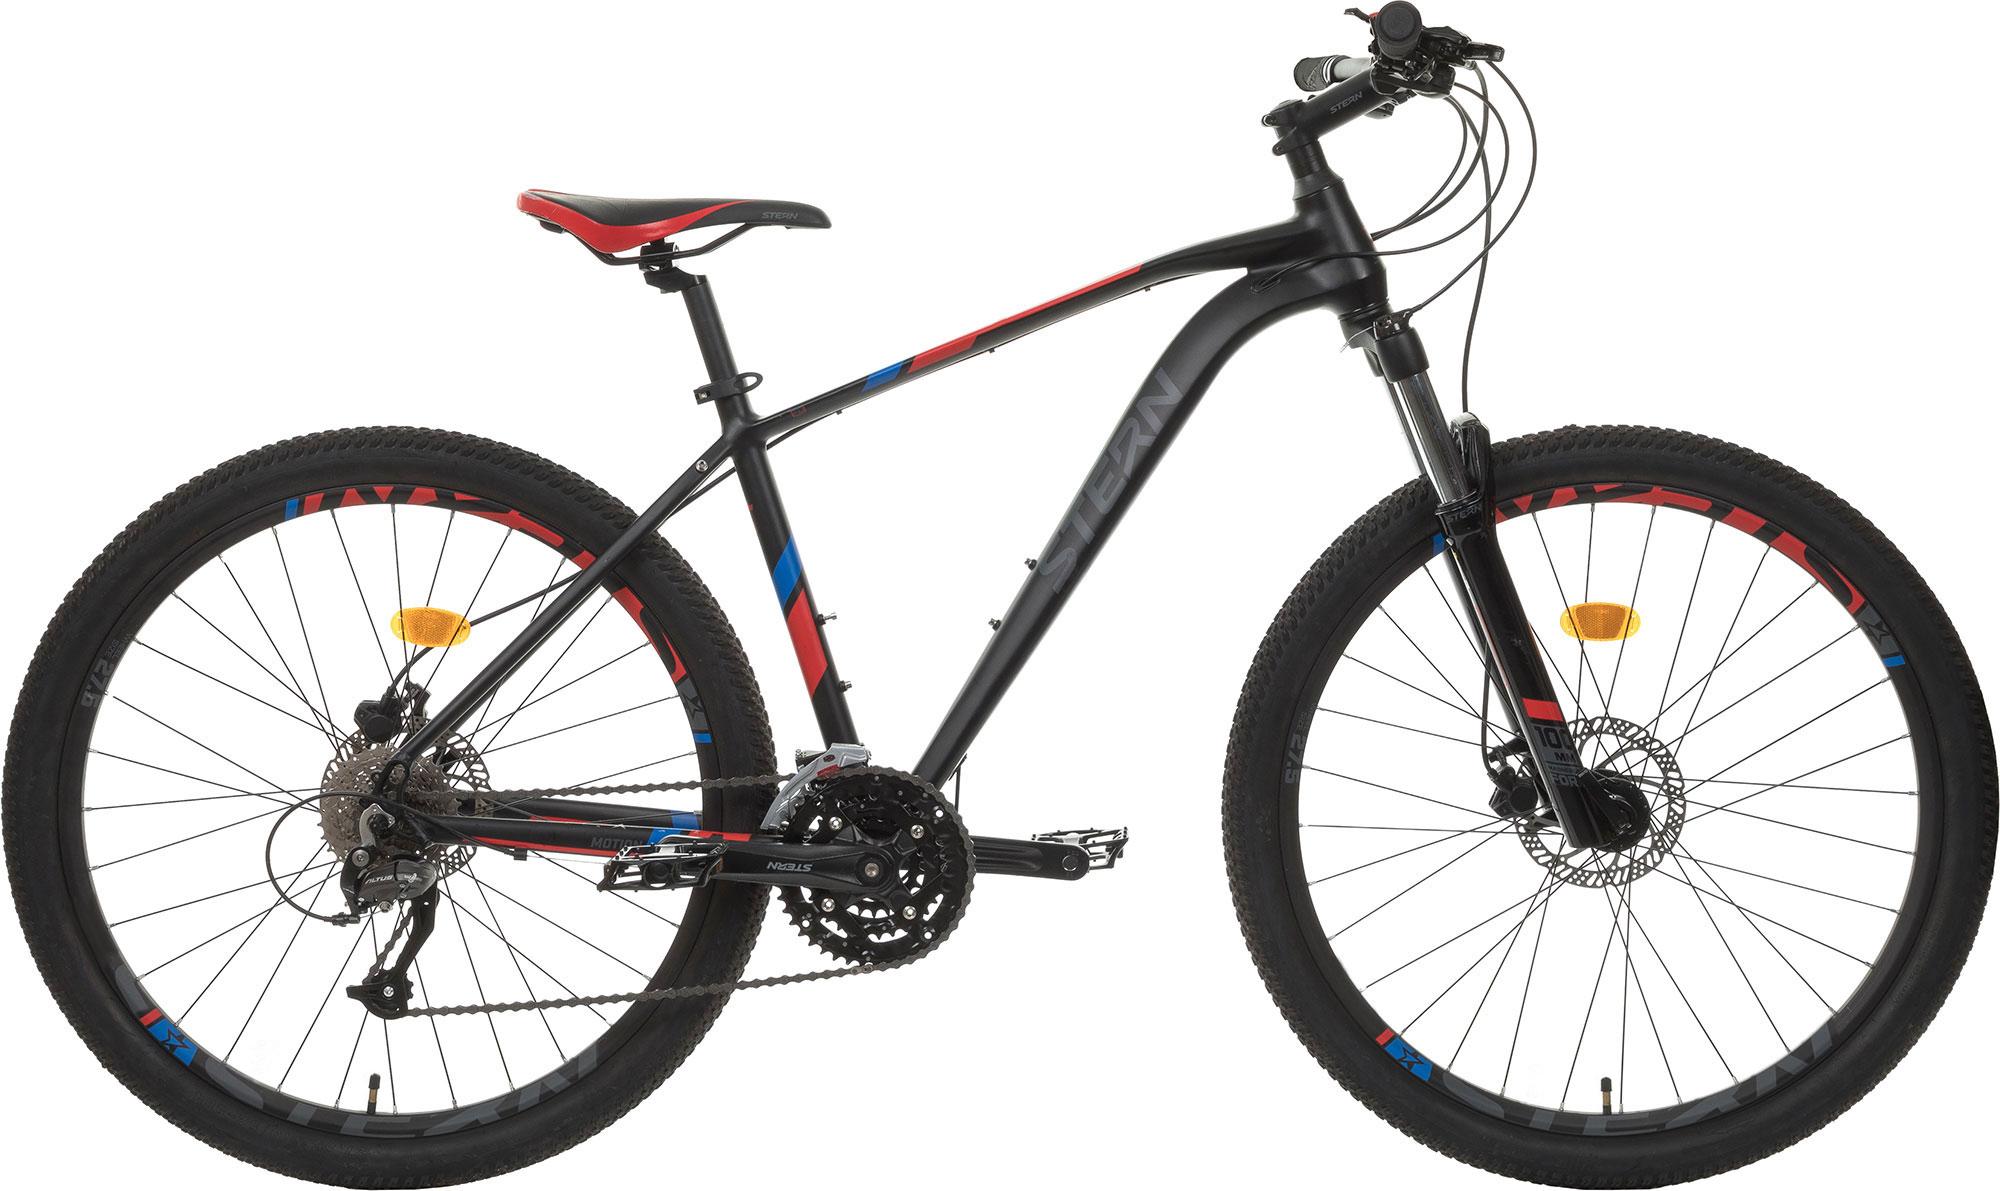 Stern Велосипед горный Stern Motion 4.0 27,5 stern stern motion 4 0 27 5 2018